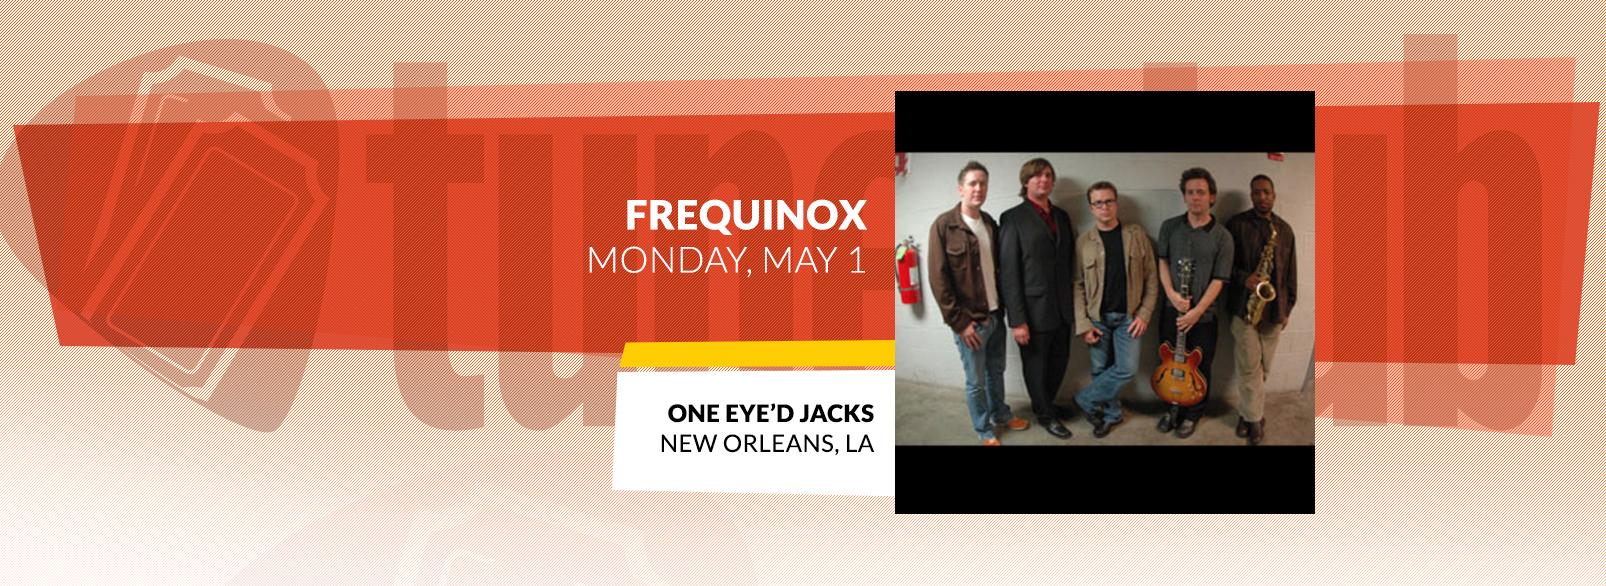 Frequinox @ One Eye'd Jacks